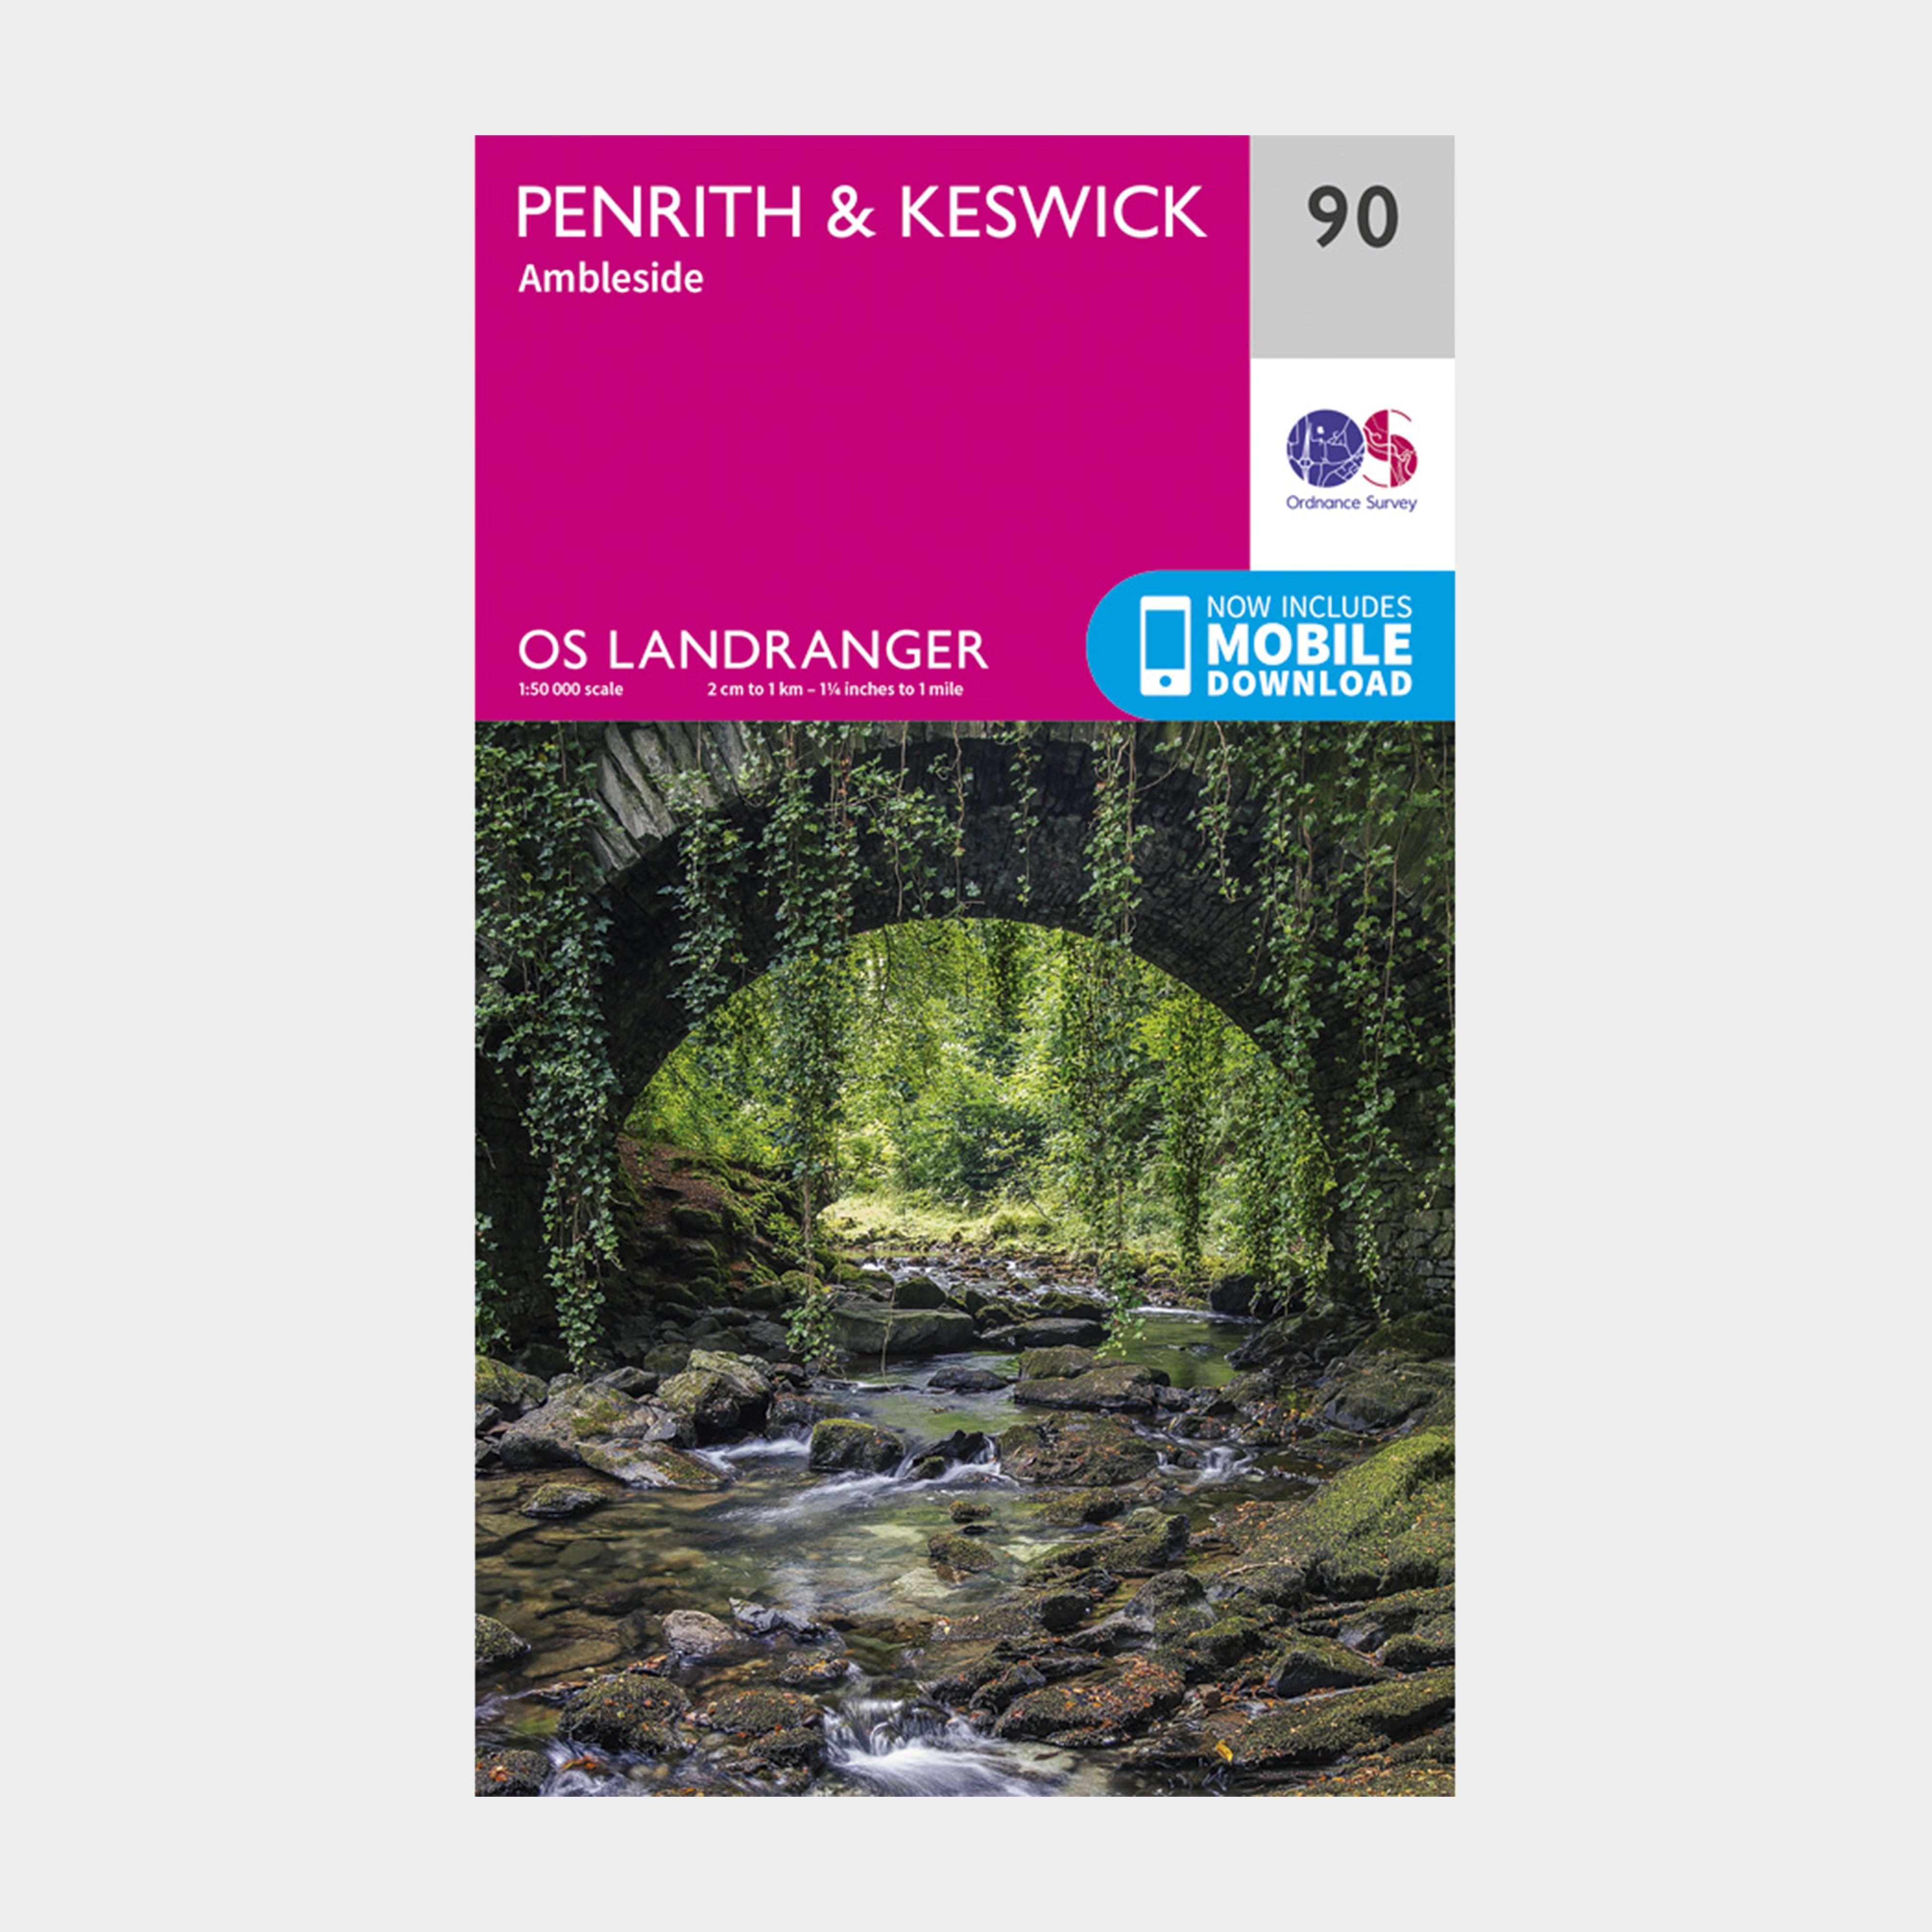 ORDNANCE SURVEY Landranger 90 Penrith & Keswick, Ambleside Map With Digital Version